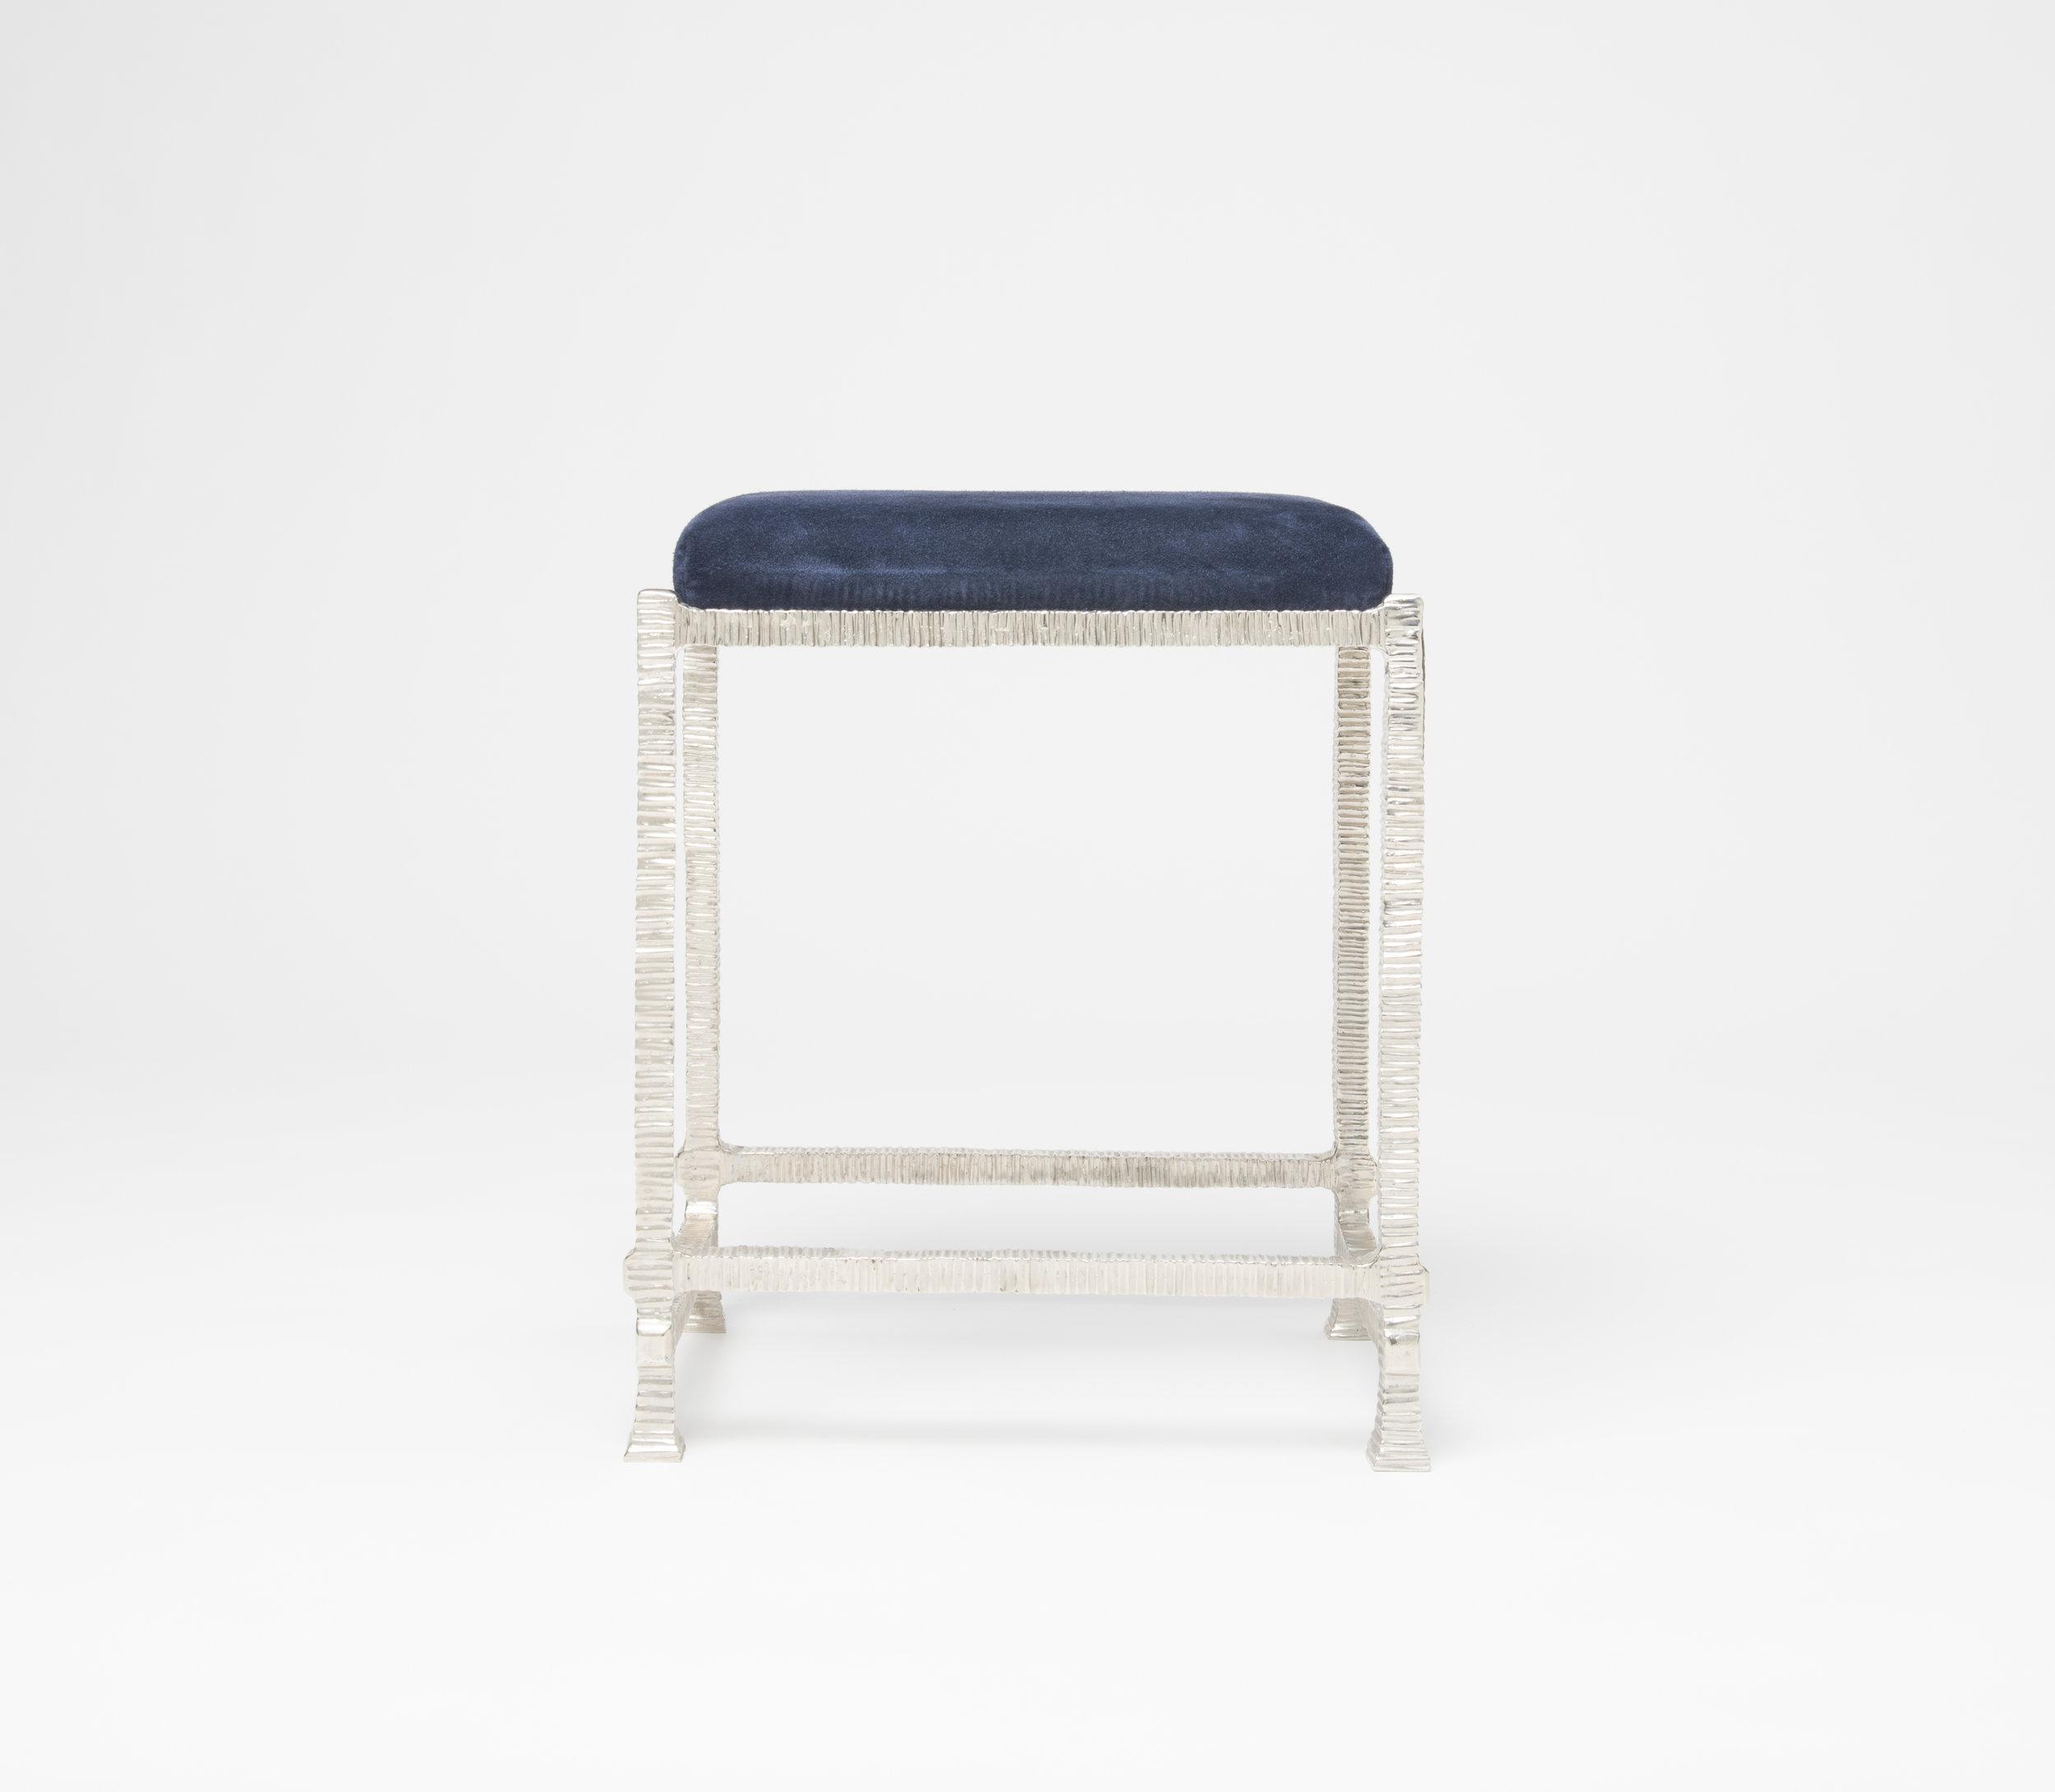 forged_bronze_stool_small.jpg